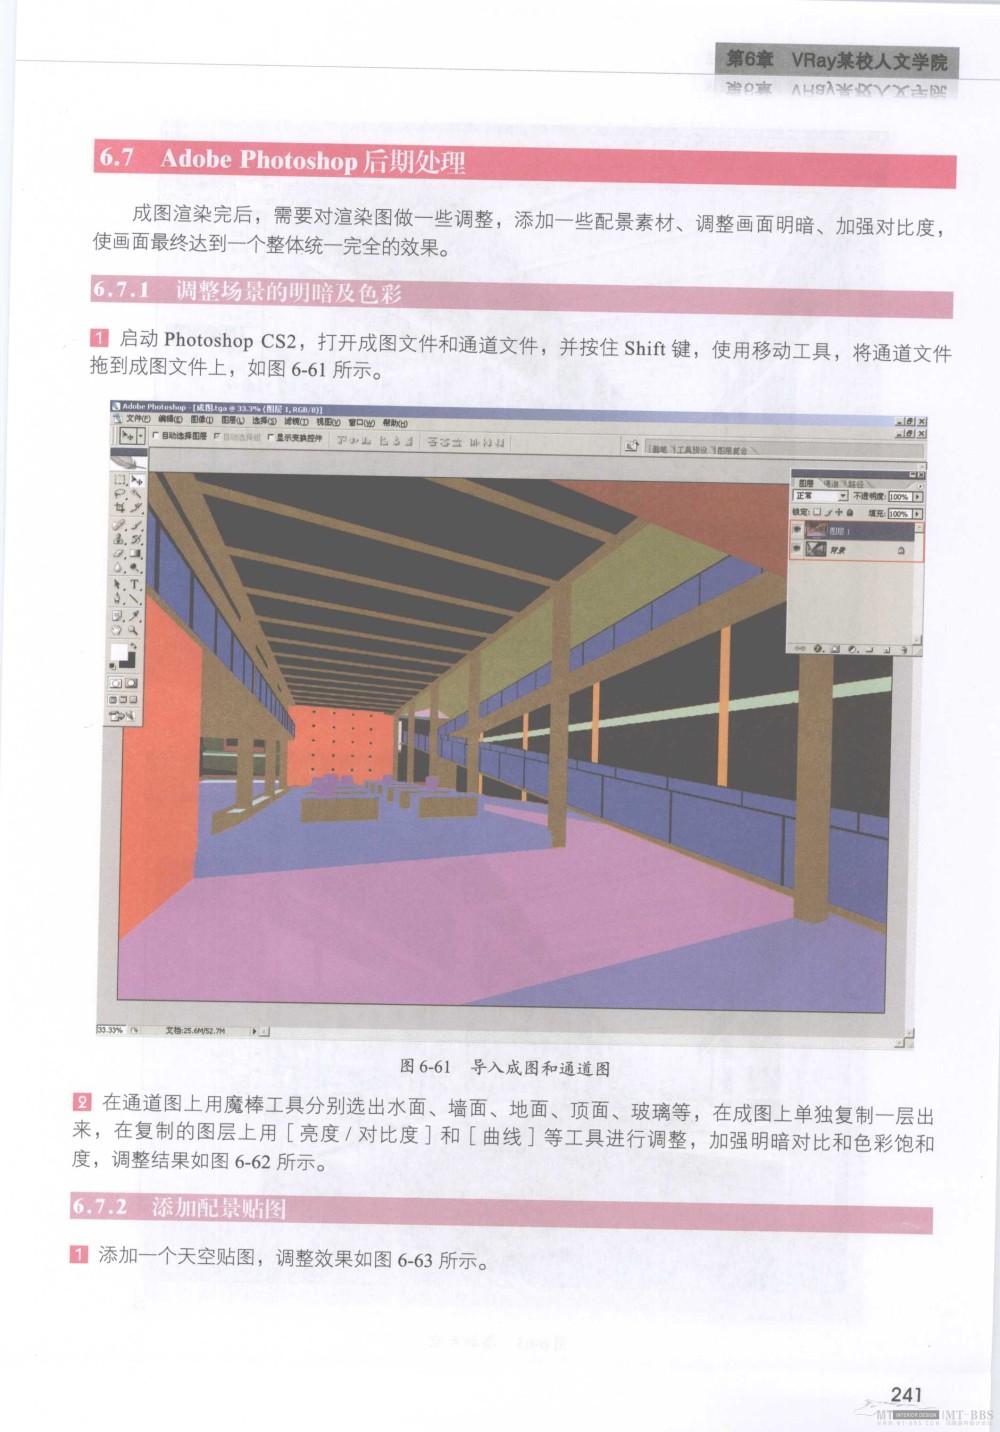 水晶石技法-3ds_Max&VRay室内空间表现_水晶石技法-3ds_Max&VRay室内空间表现_页面_247.jpg